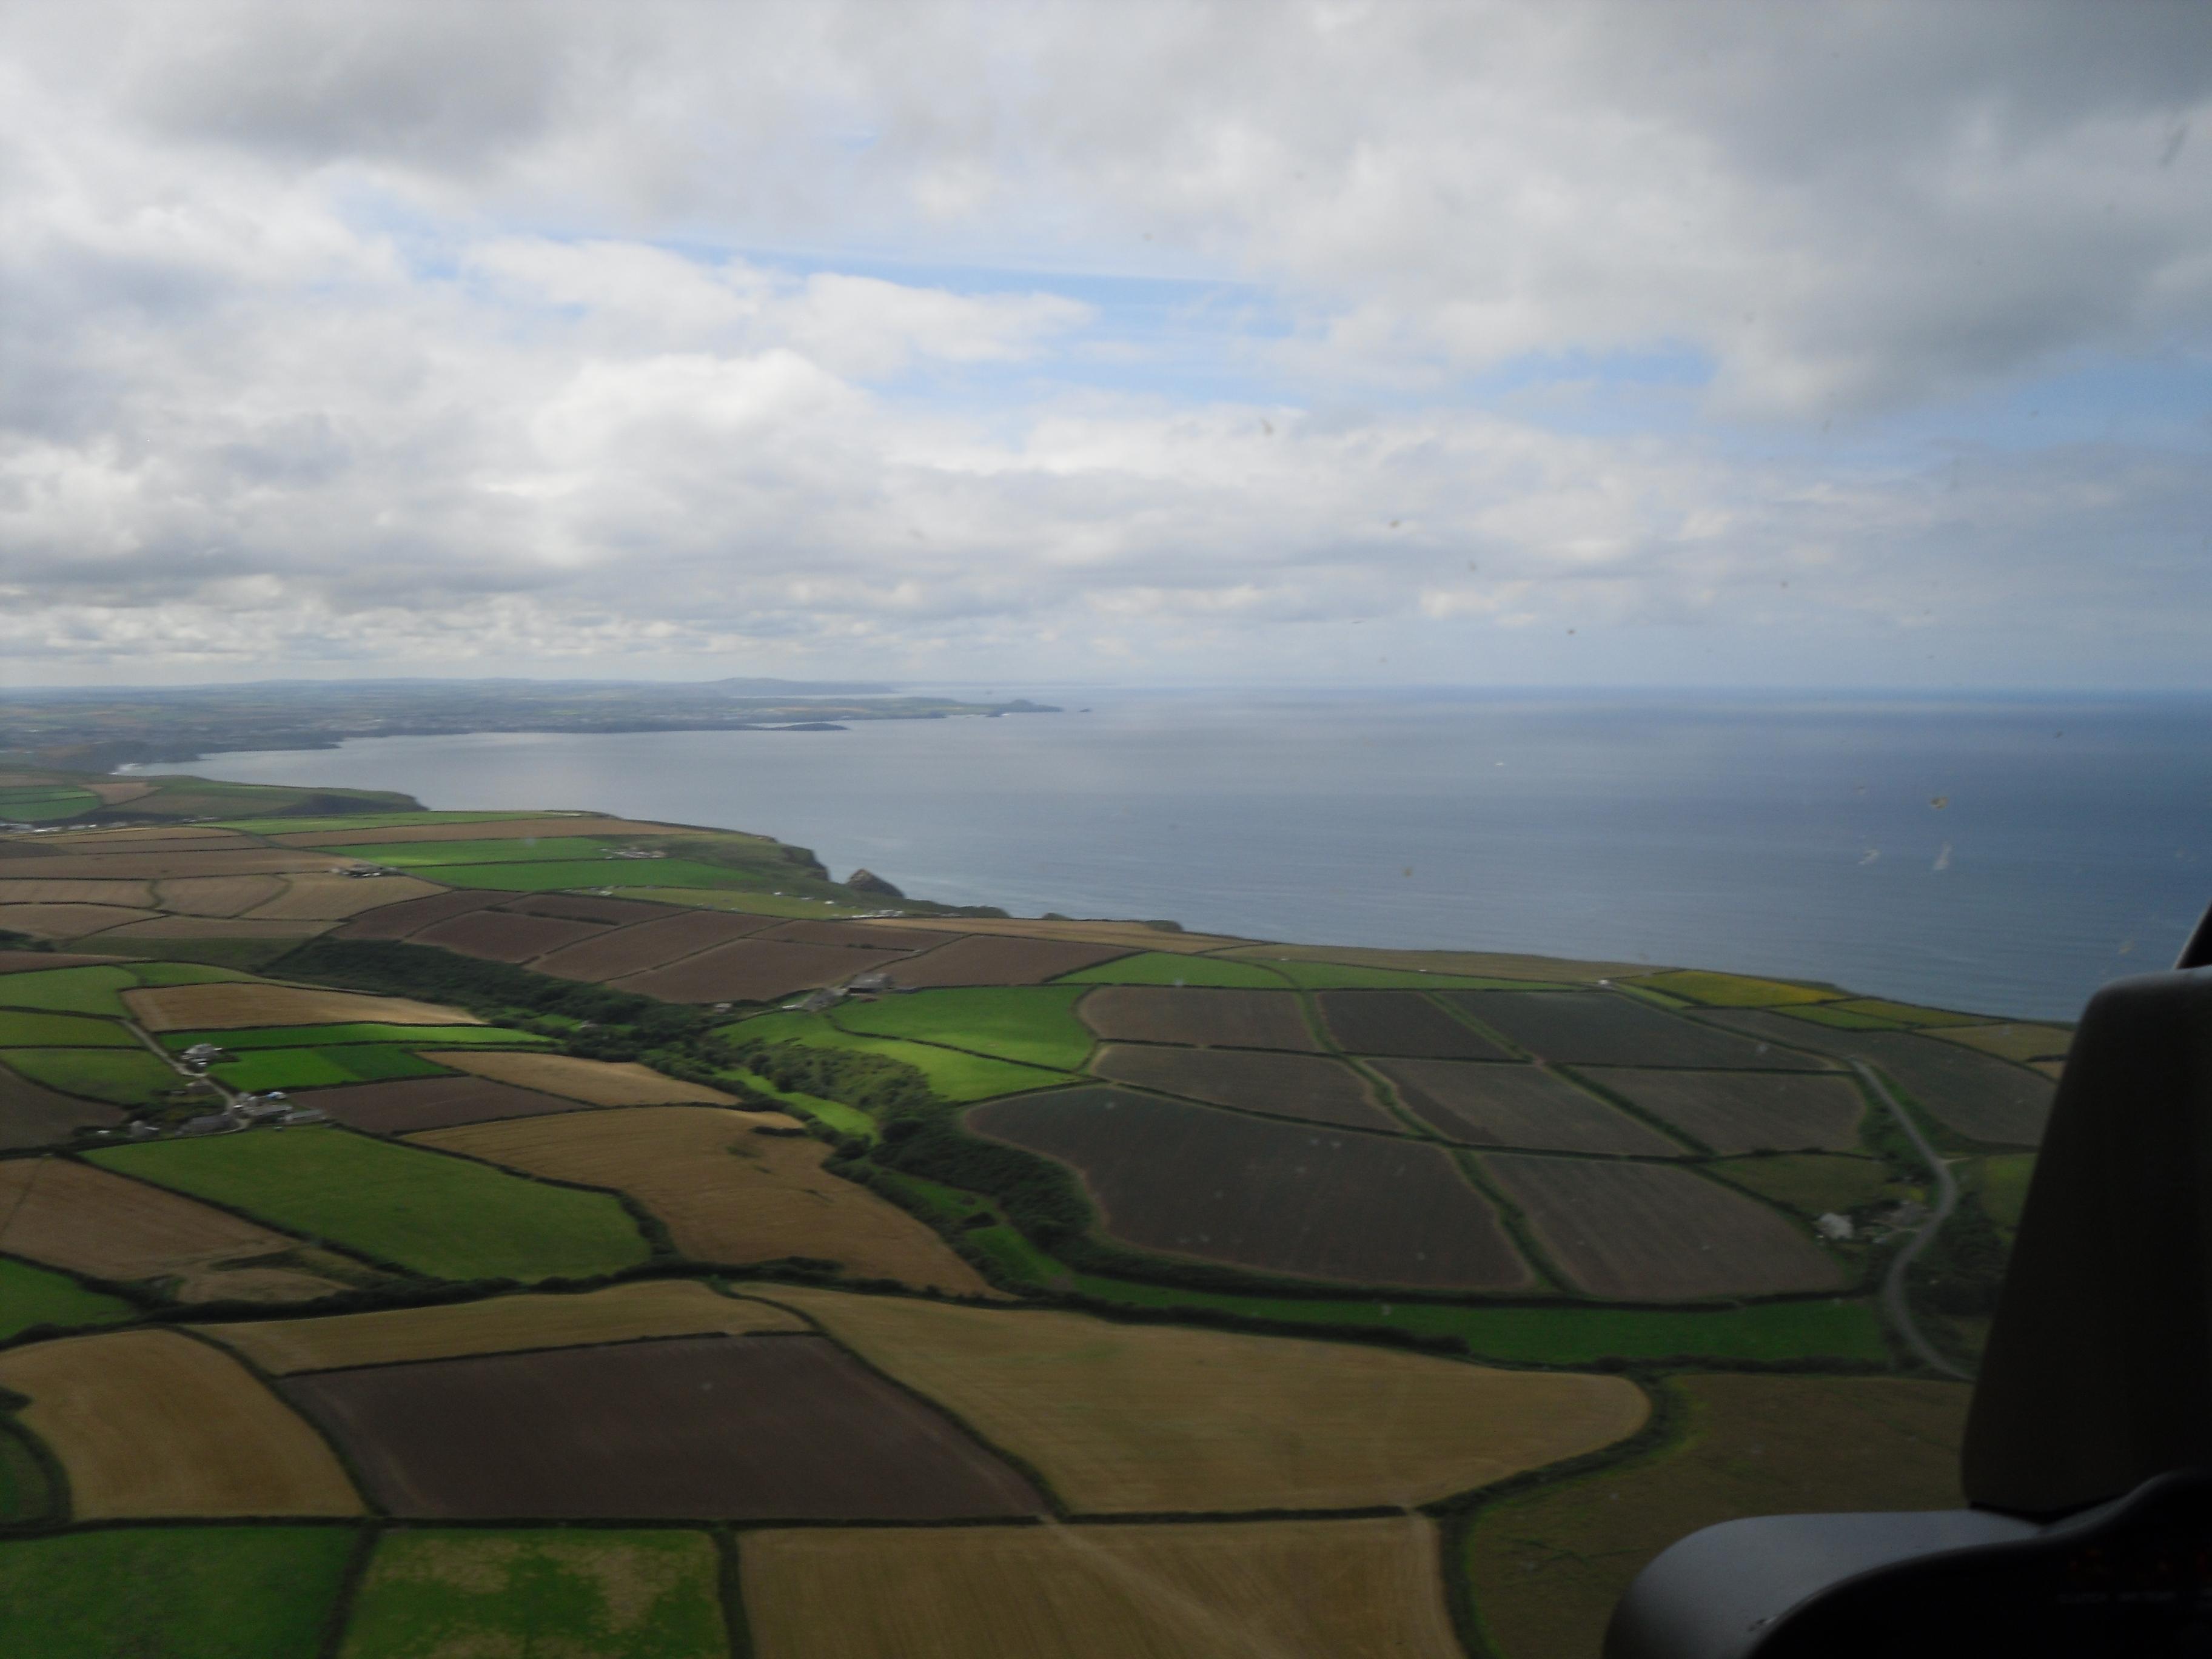 Cornish coast aerial view photo